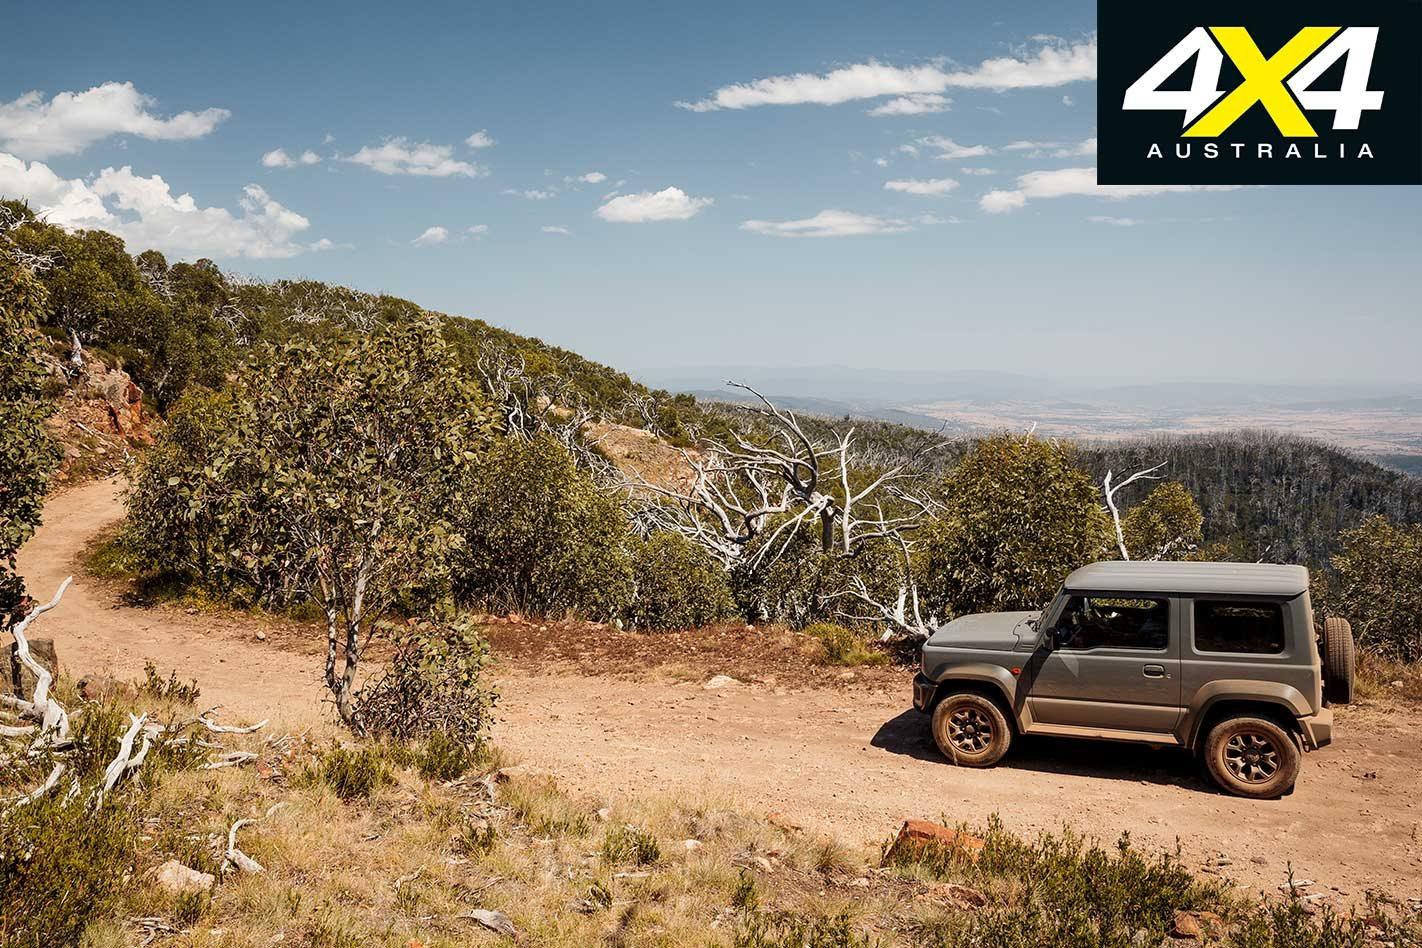 2019 Suzuki Jimny Off Road Review 4x4 Australia